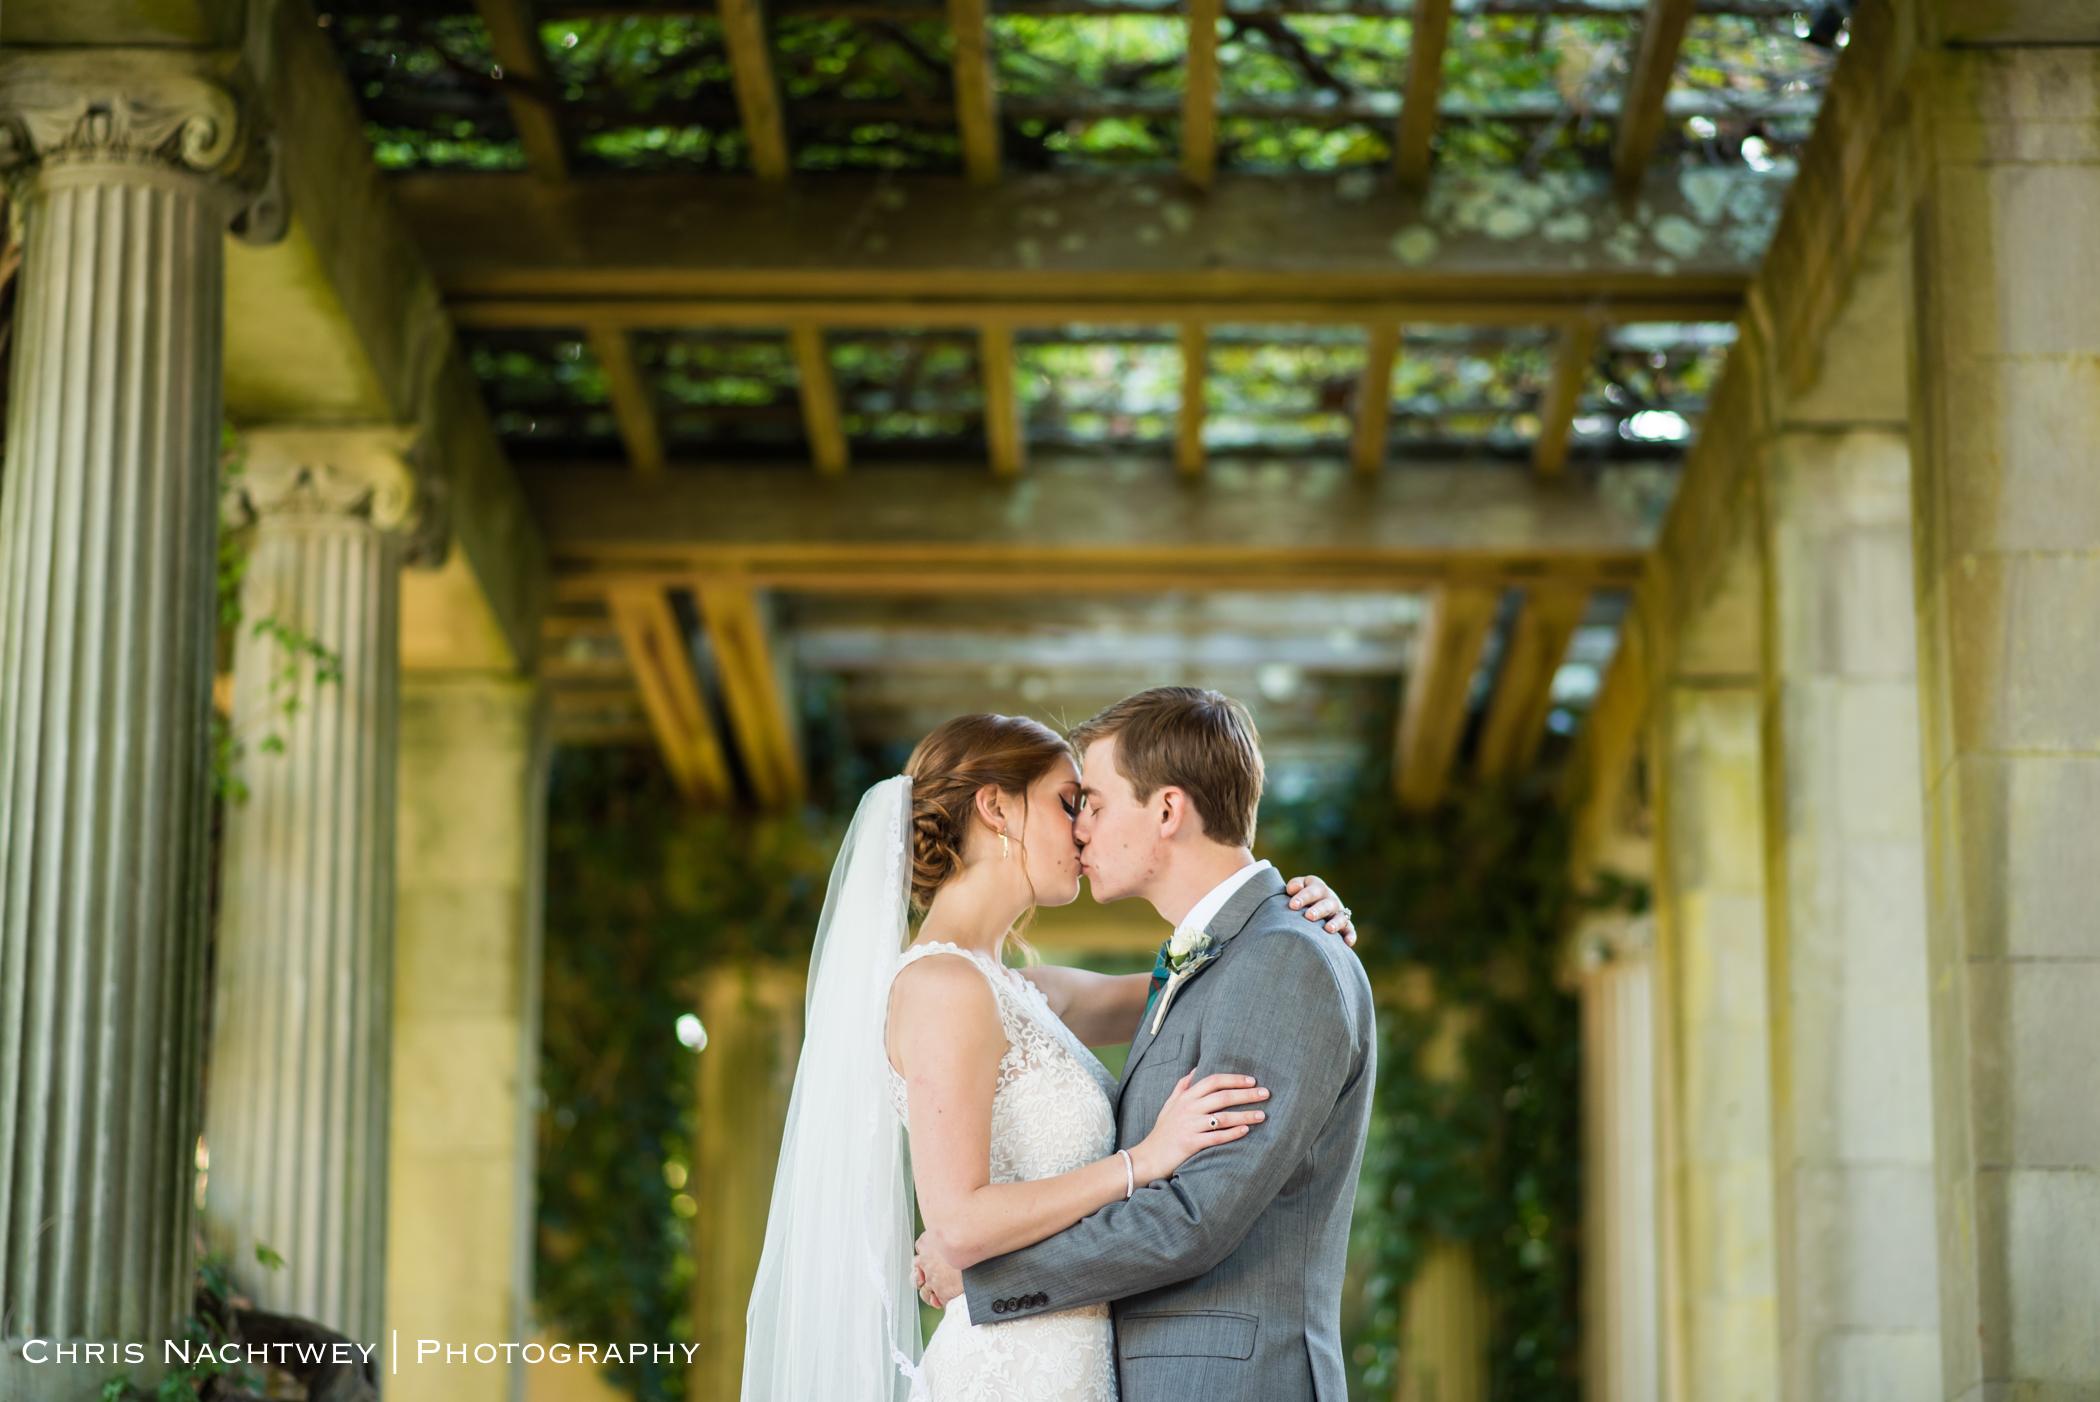 harkness-wedding-photos-chris-nachtwey-photography-2018-22.jpg